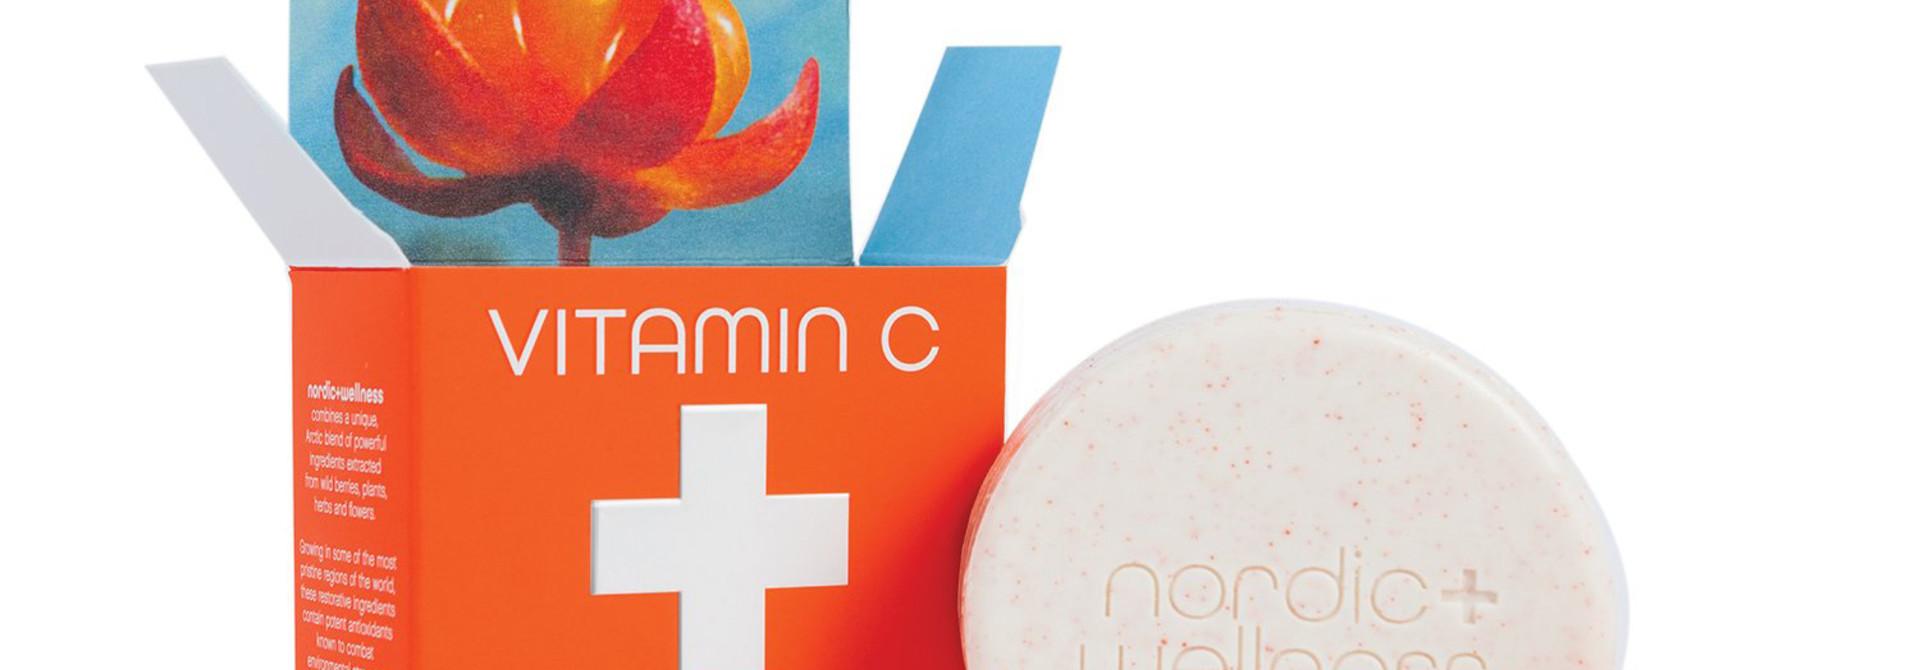 Nordic Wellness - Vitamin C